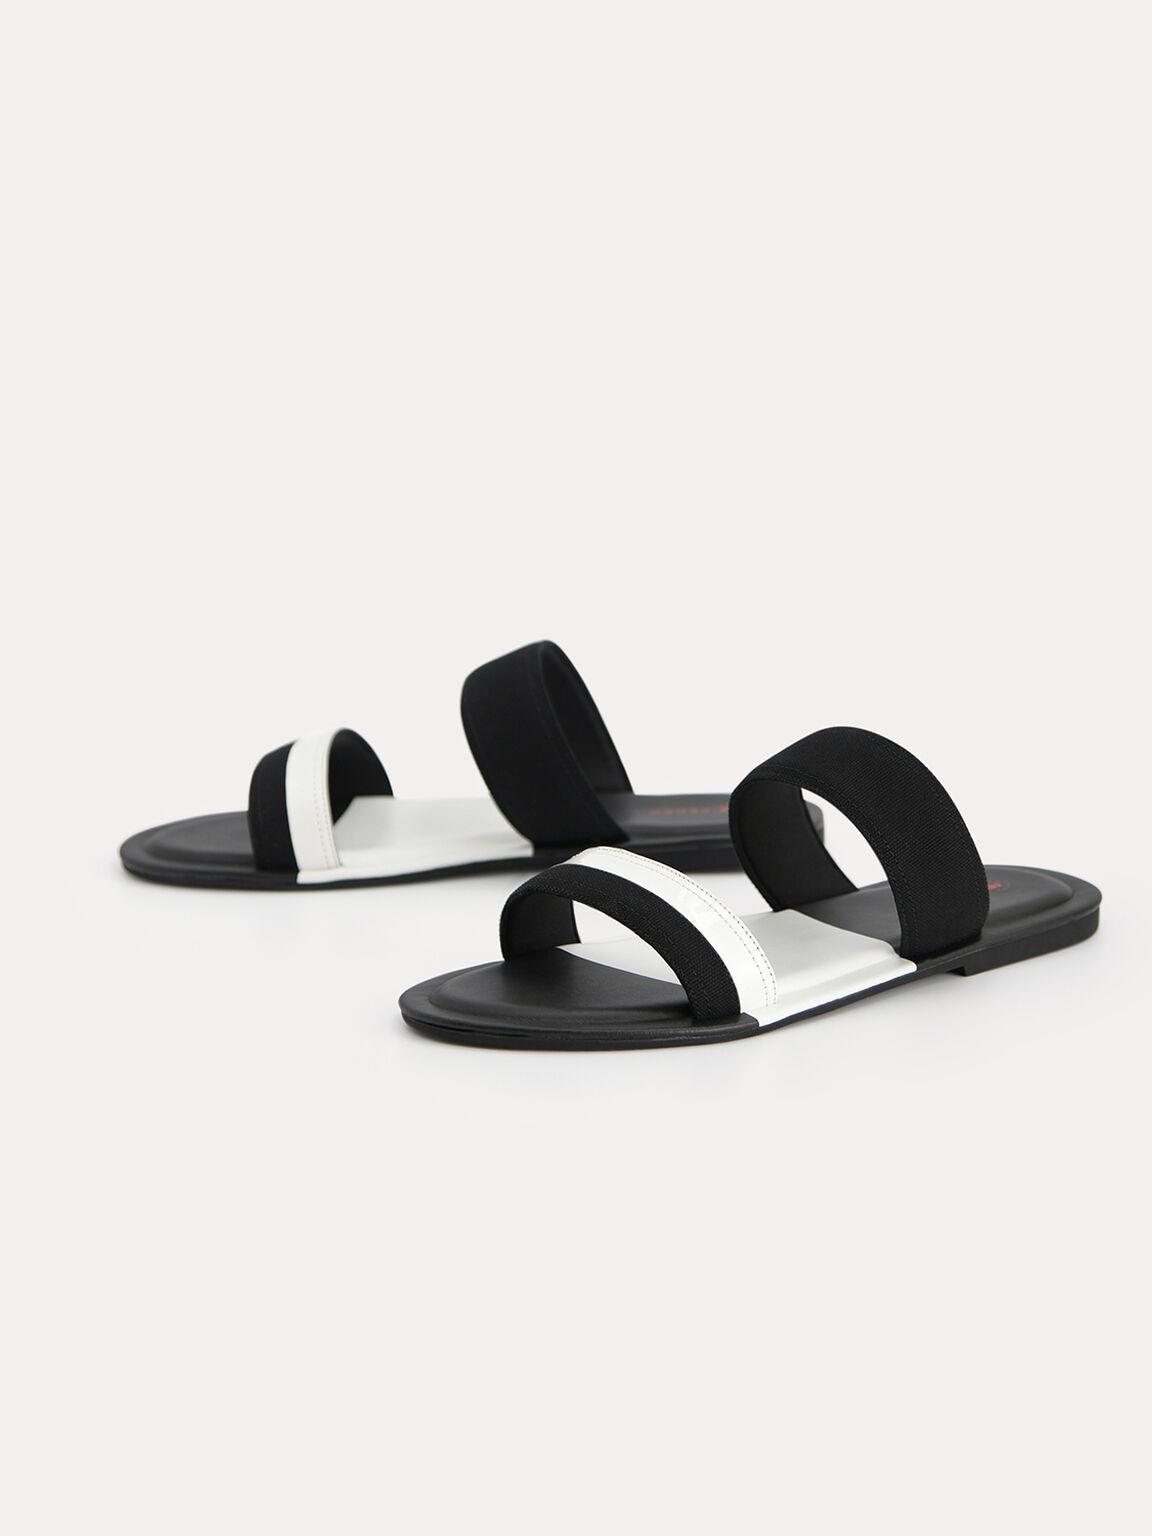 rePEDRO Duo-Tone Sandal, Black, hi-res